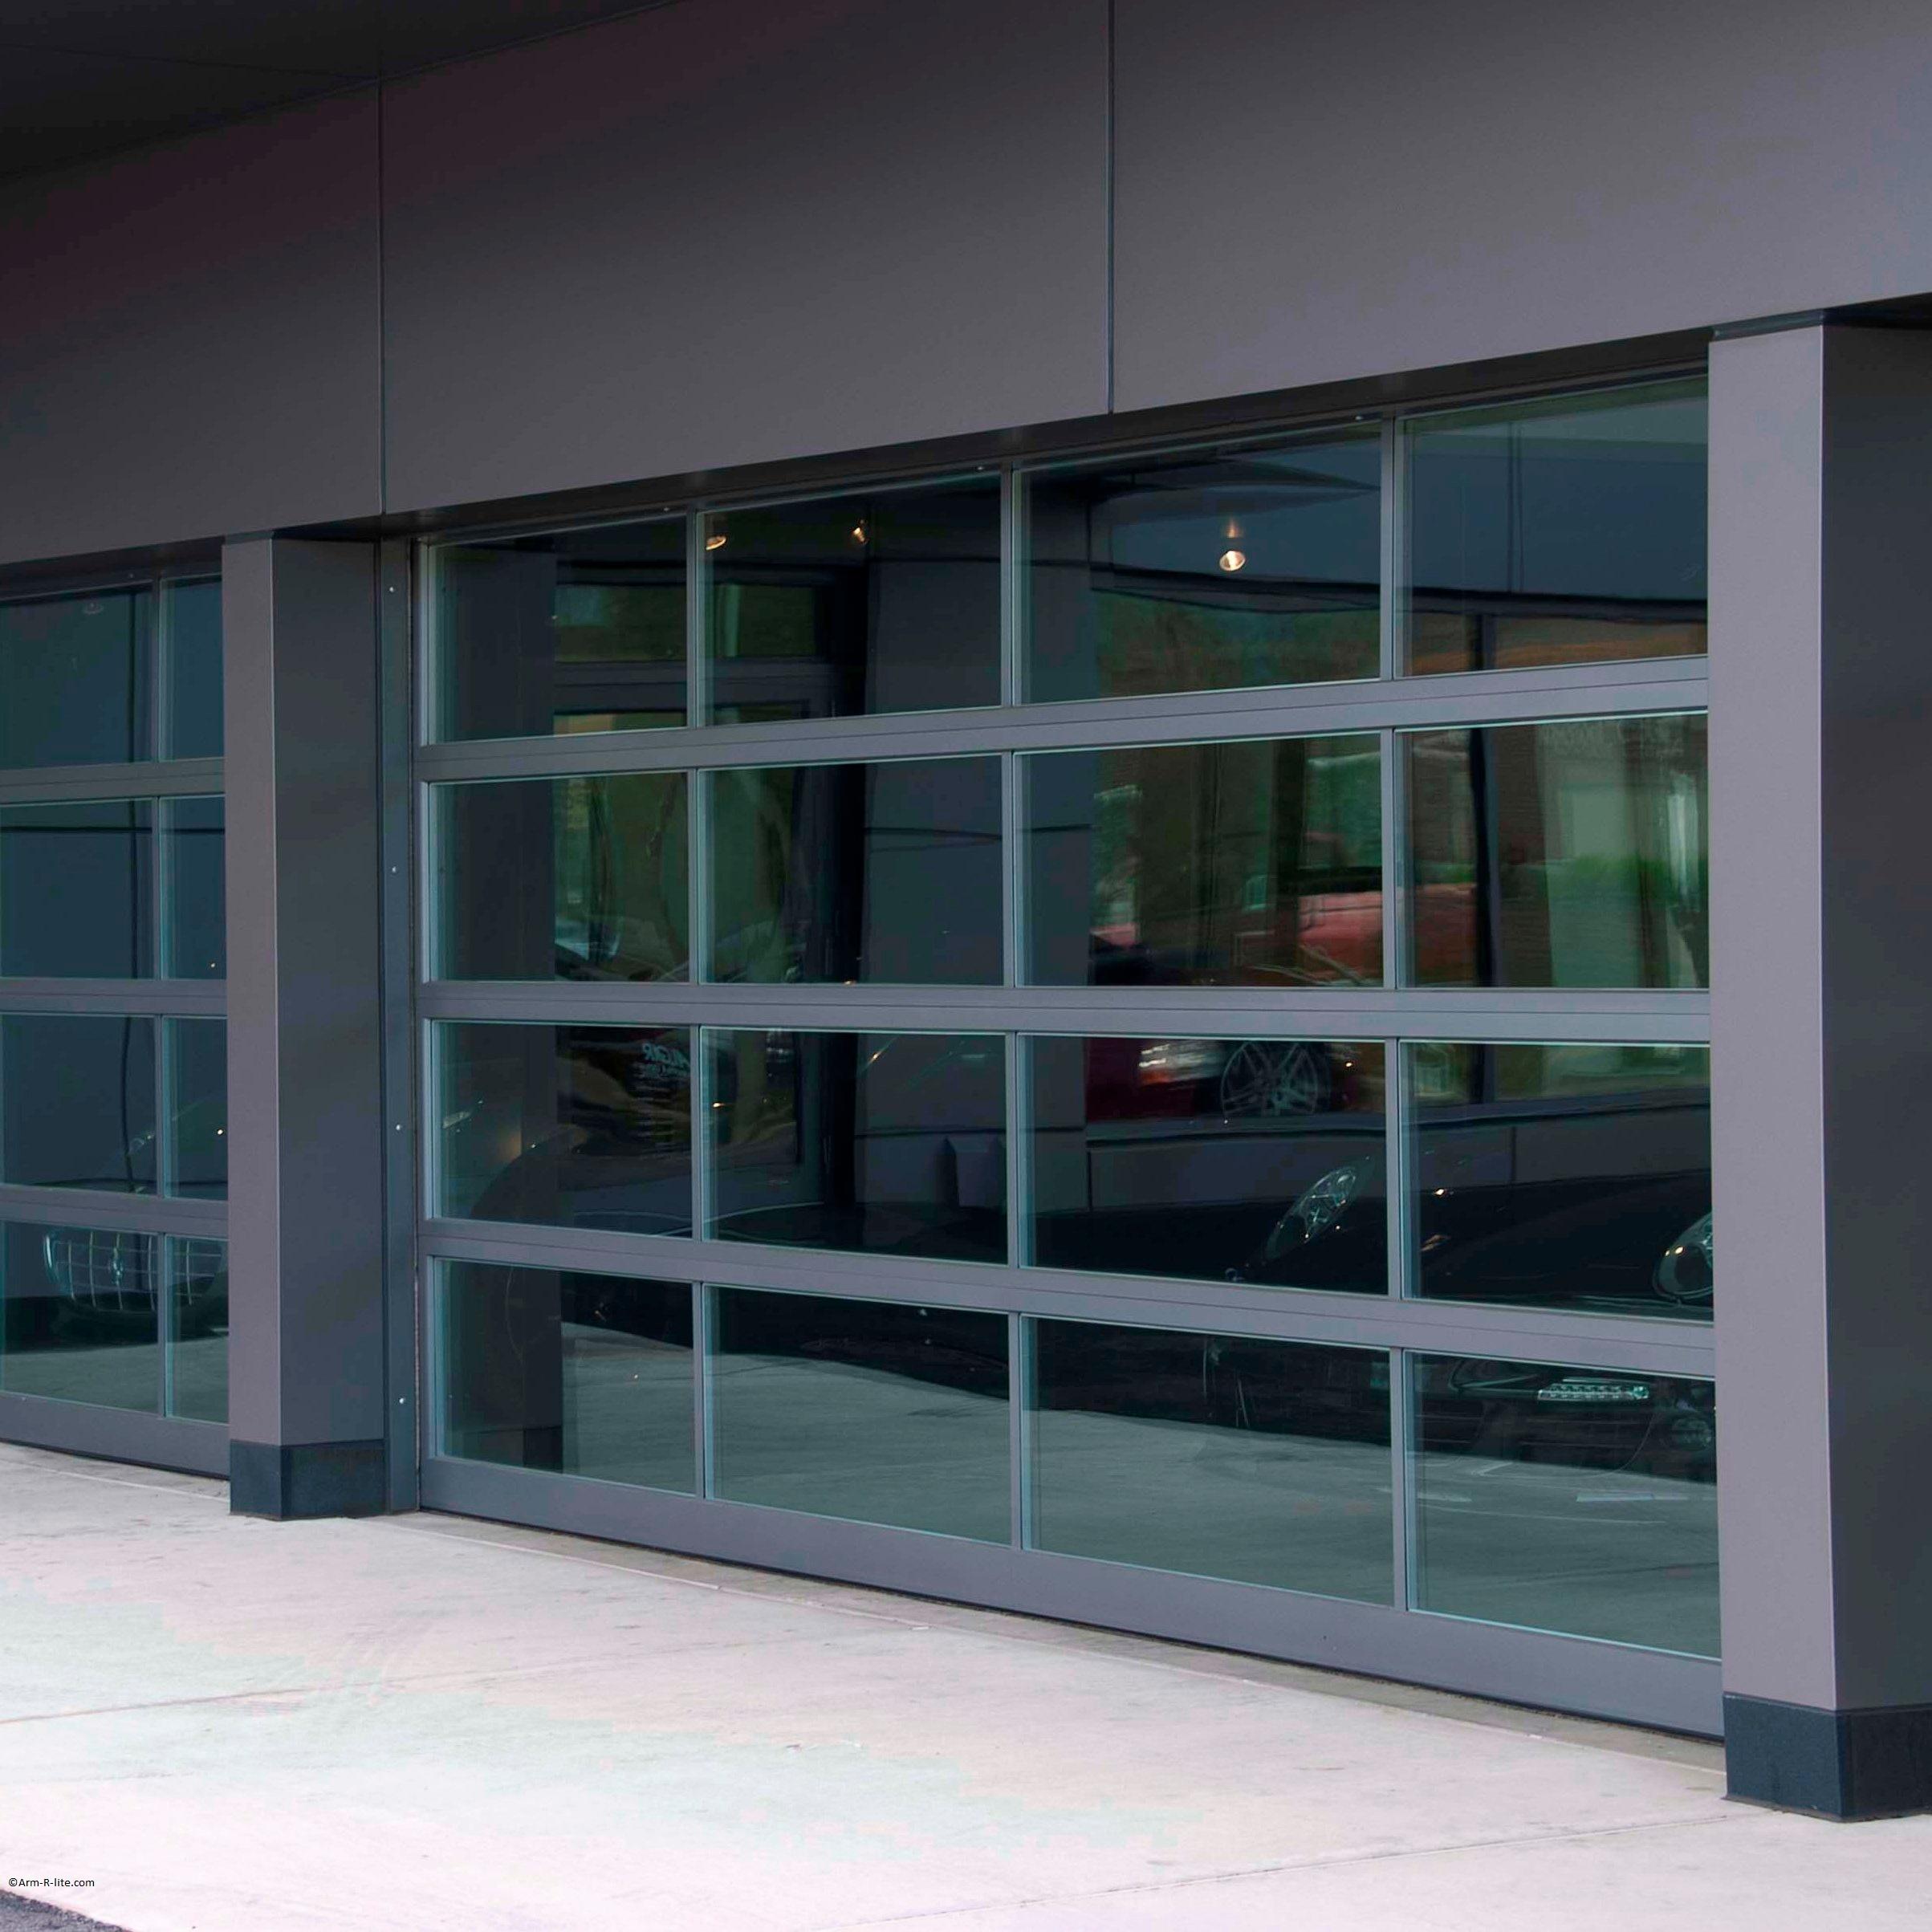 Ferrari glass garage doors by Arm-R-Lite